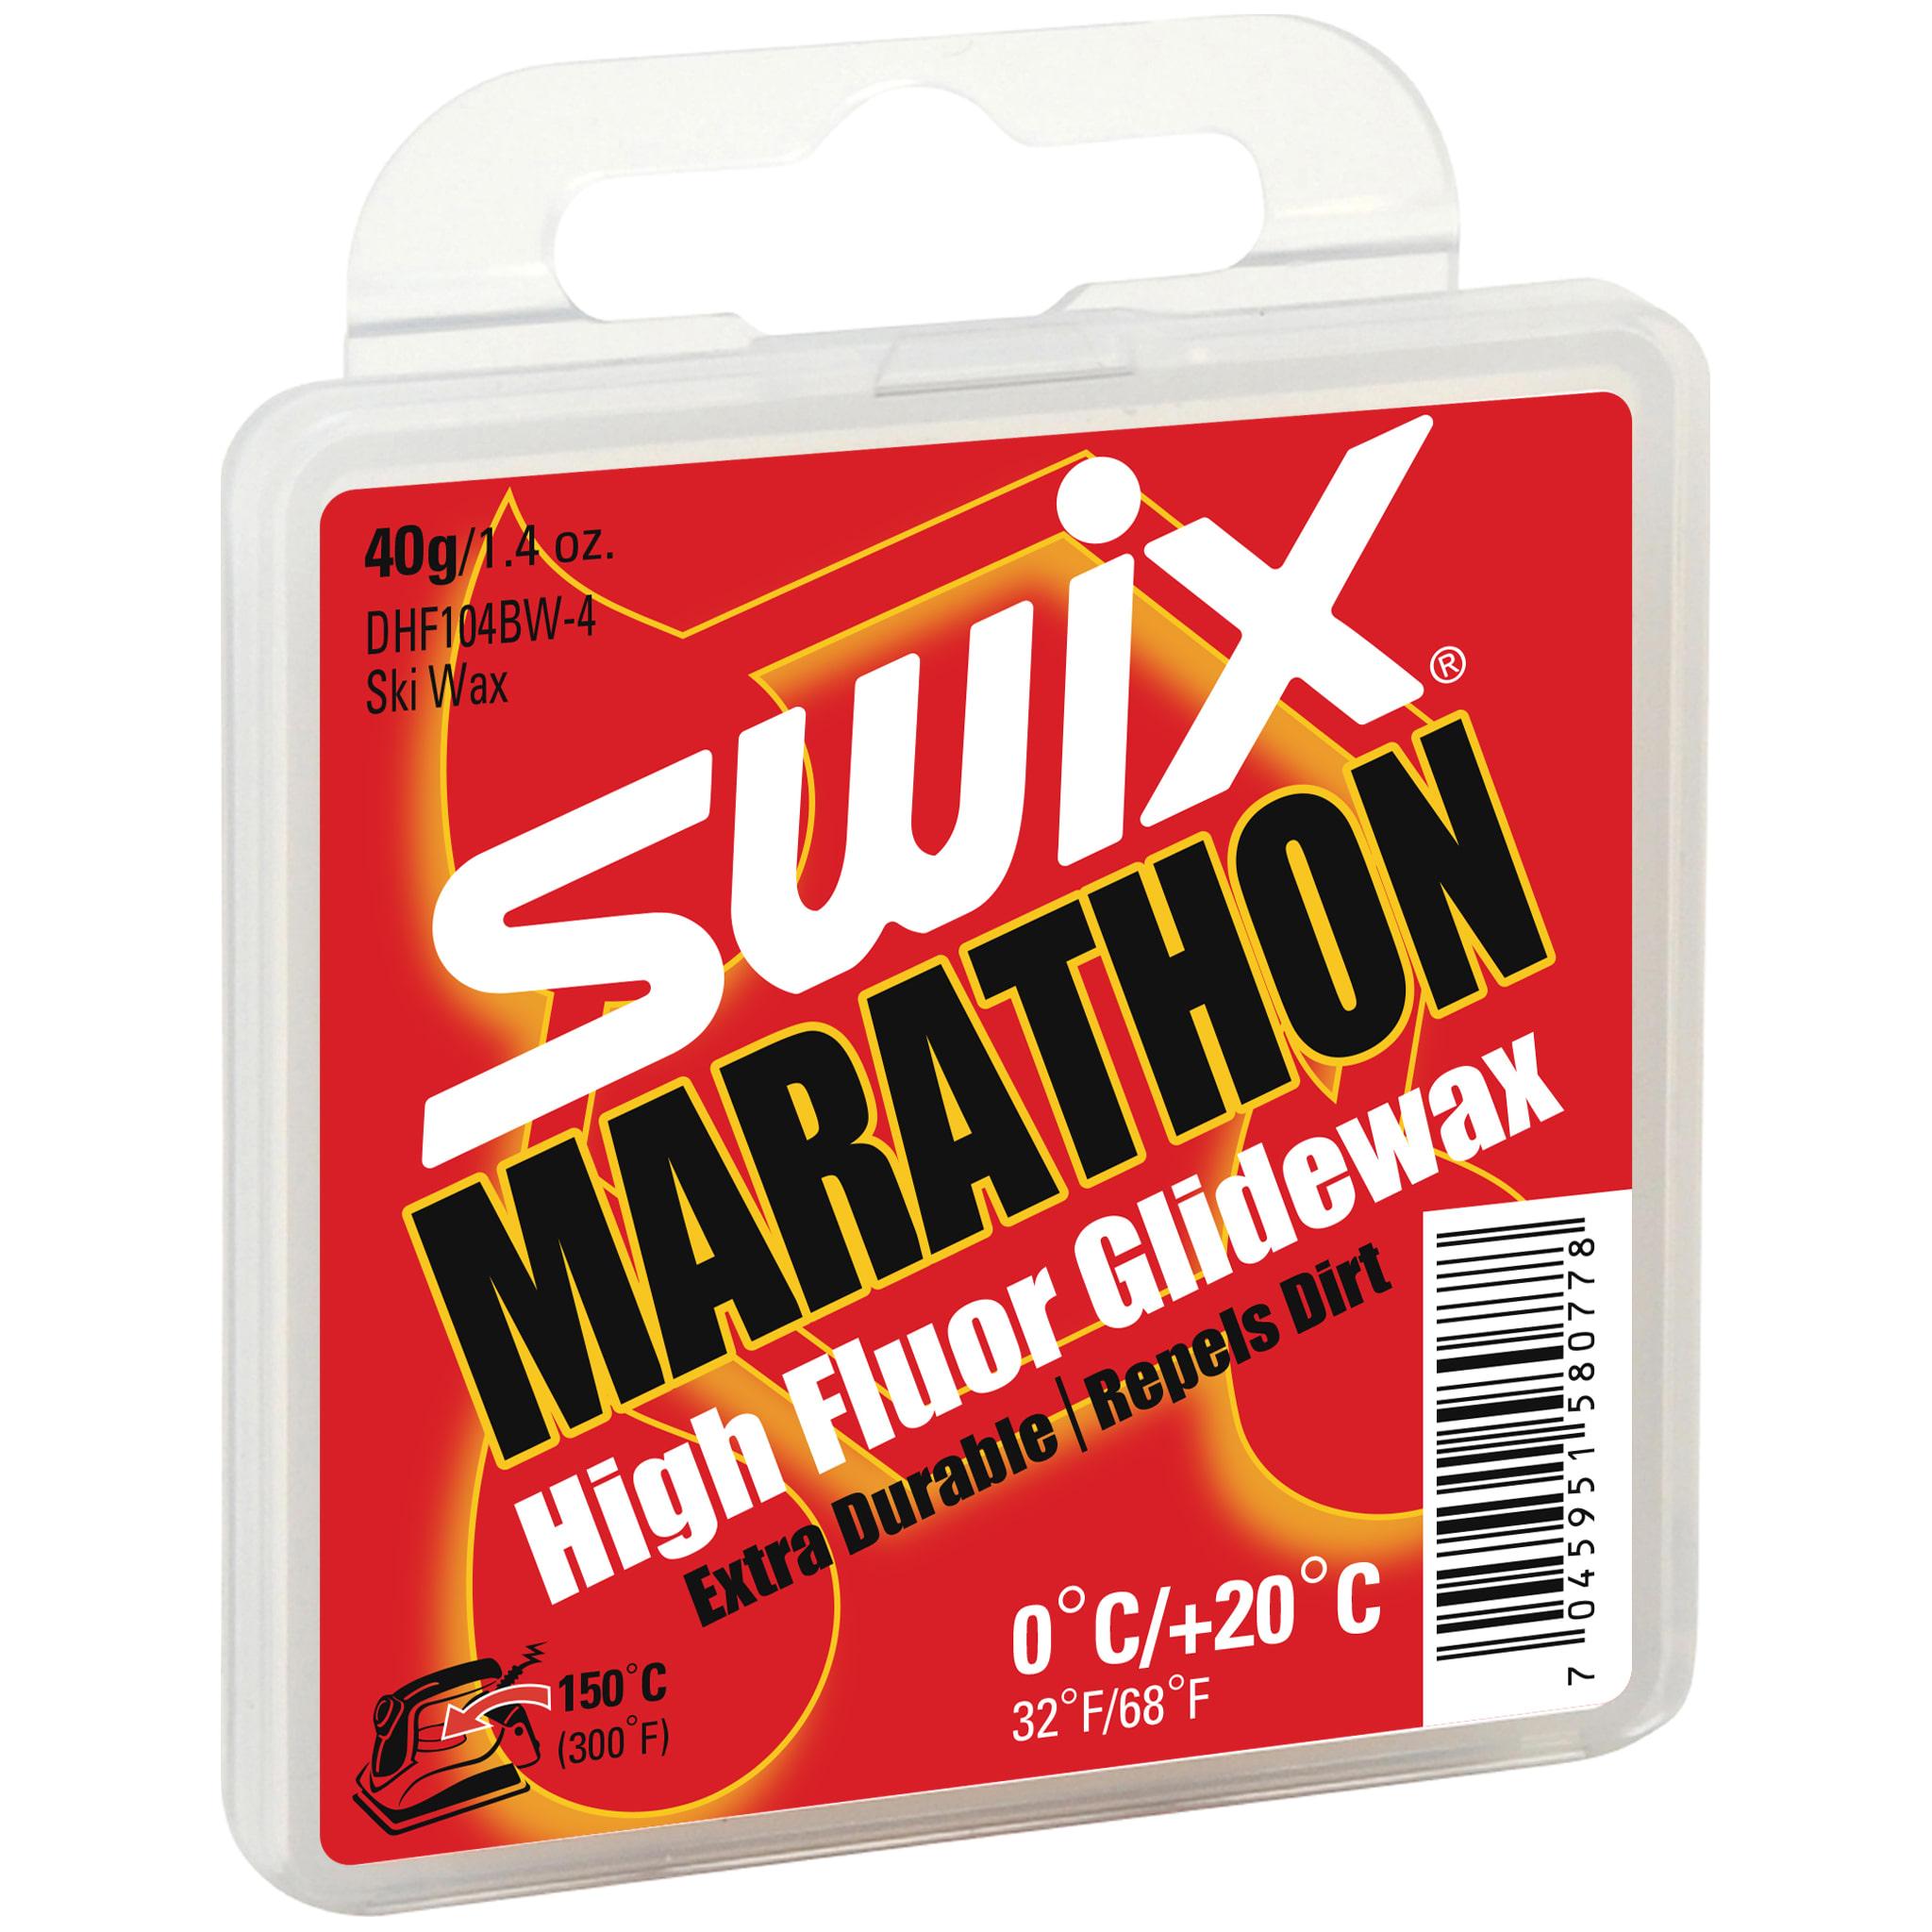 DHF104BW Marathon